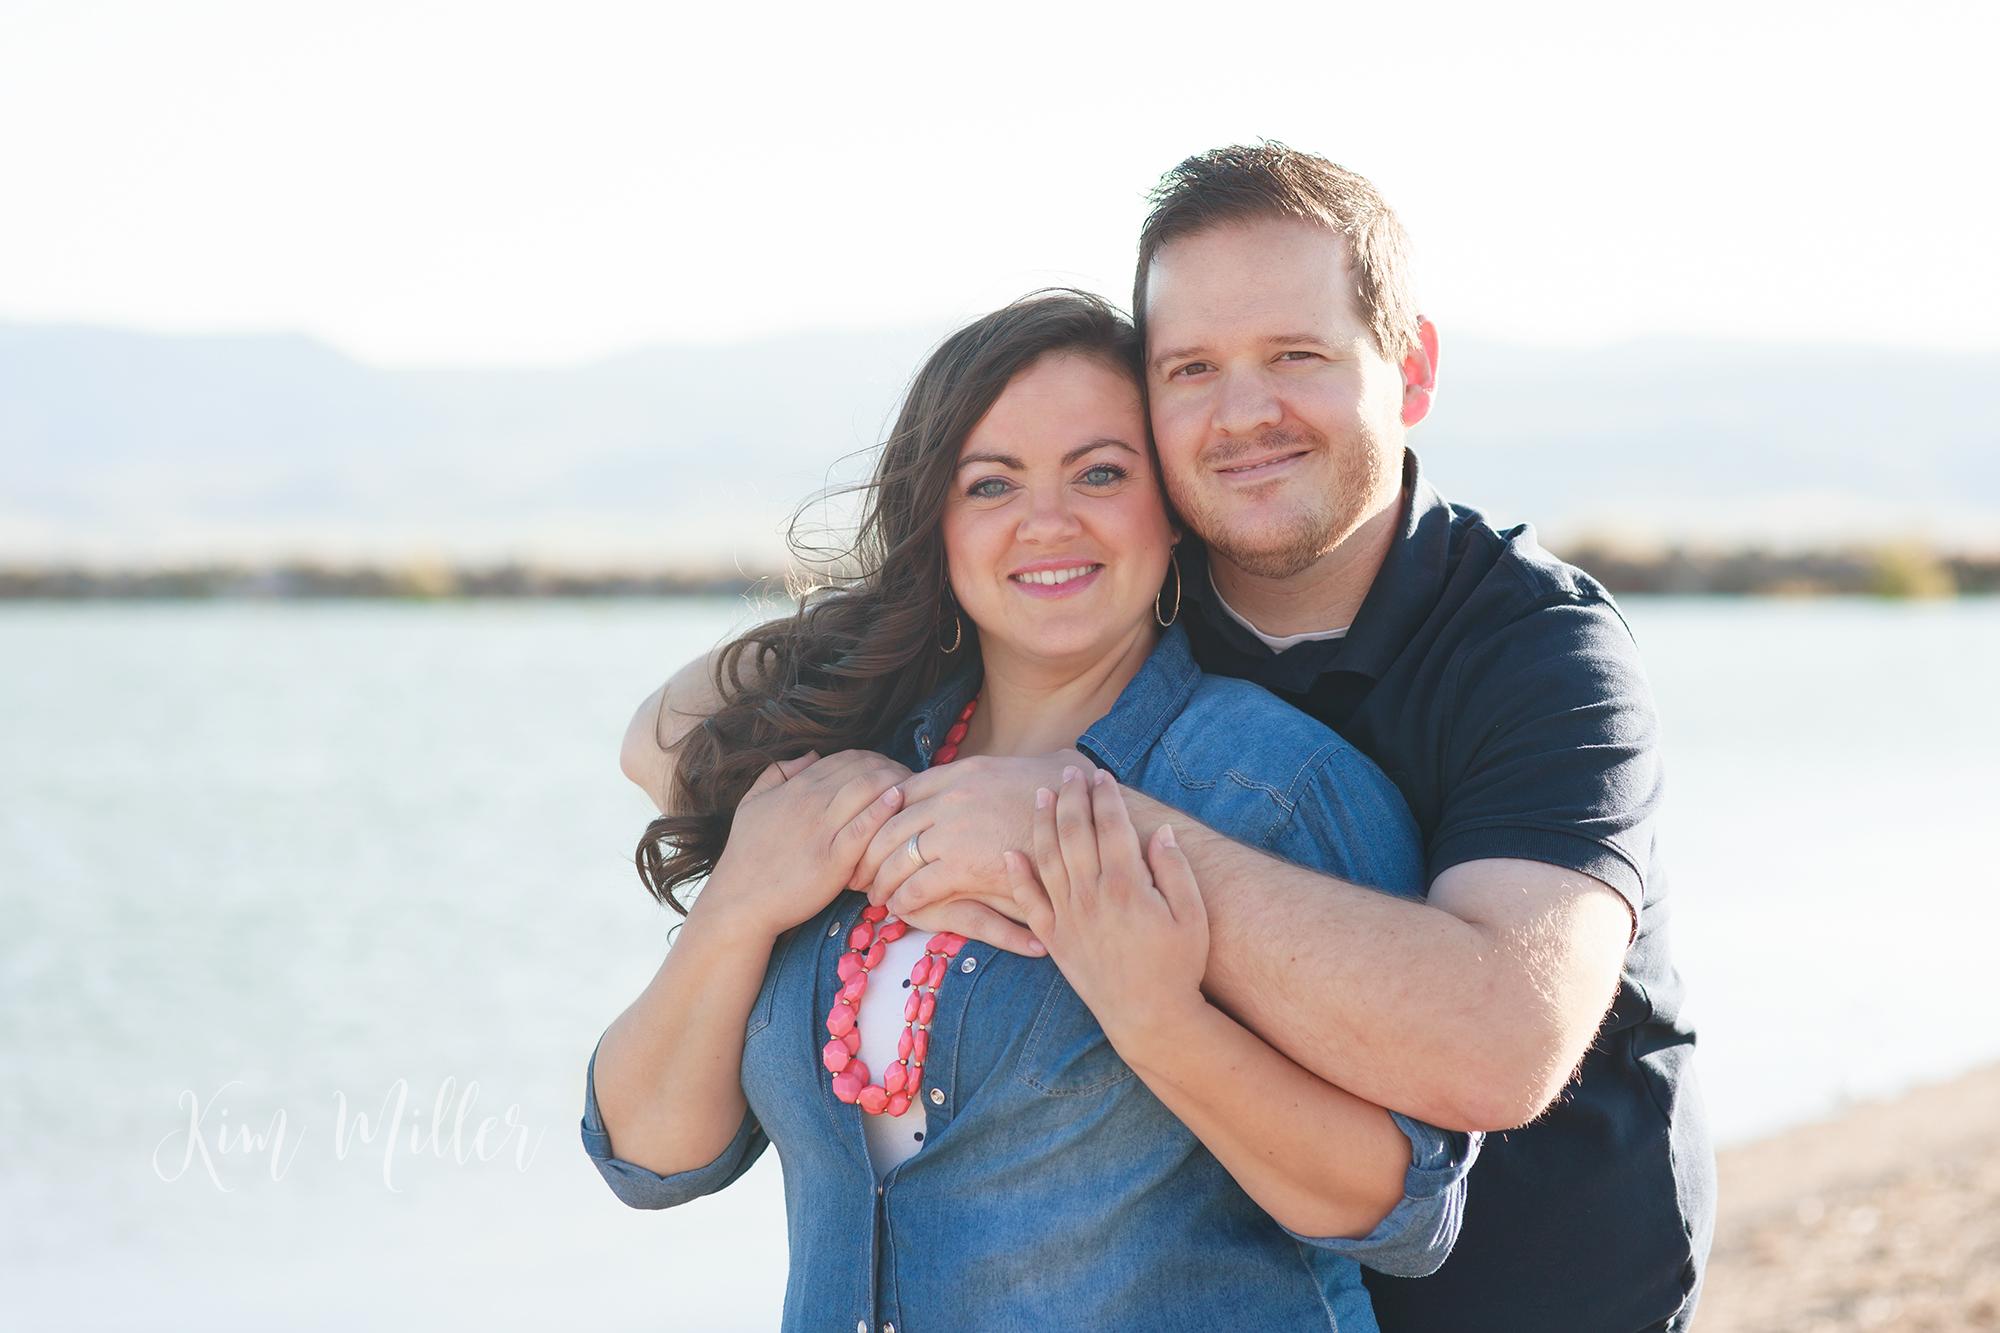 Bear Lake, Family Portraits, Beach Photos, beach Photography, Las Vegas Portraits